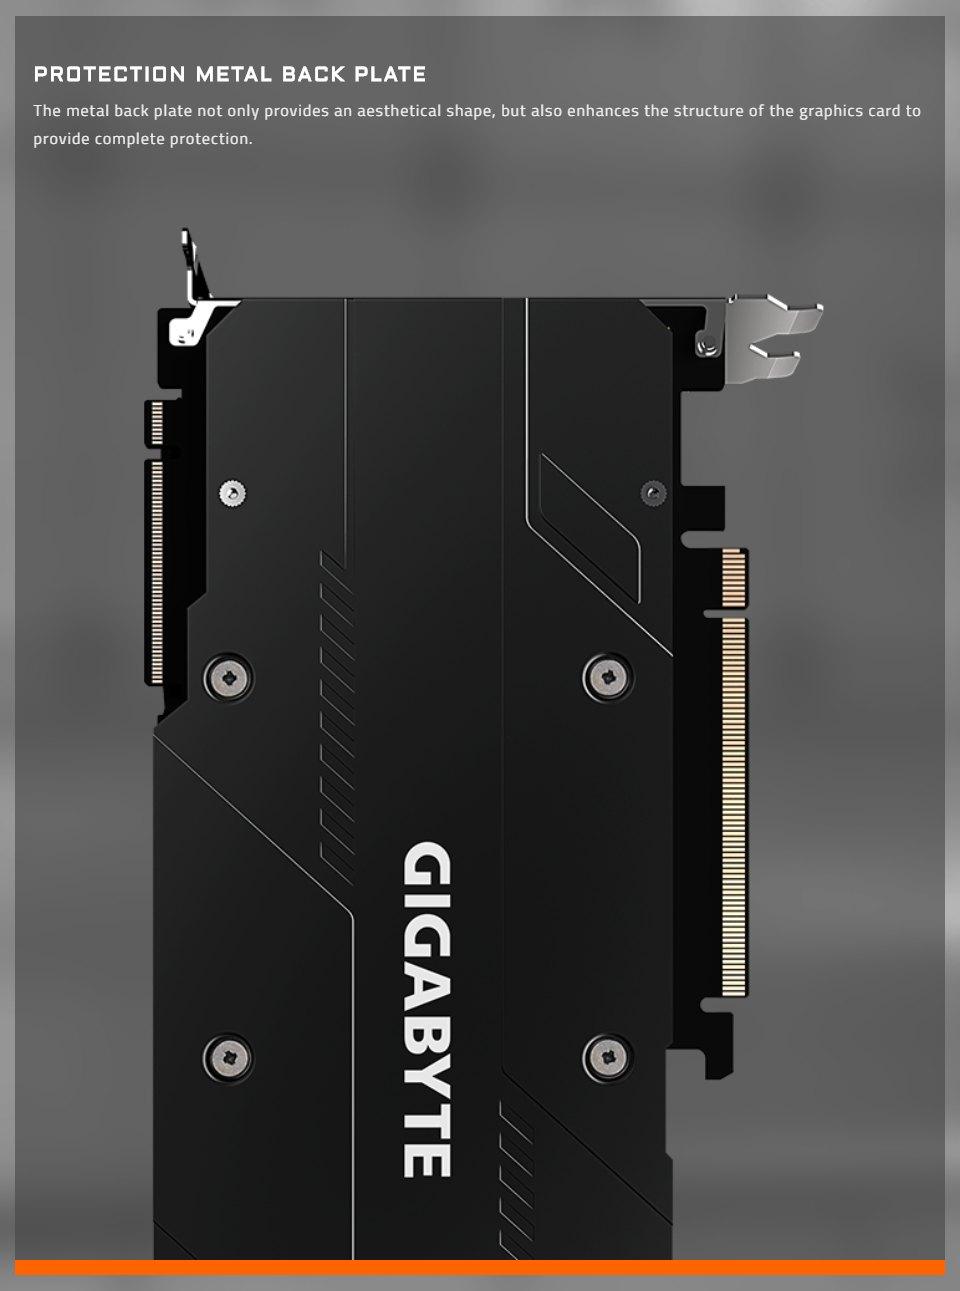 Gigabyte GeForce RTX 2070 Super Gaming OC 3X 8GB features 7